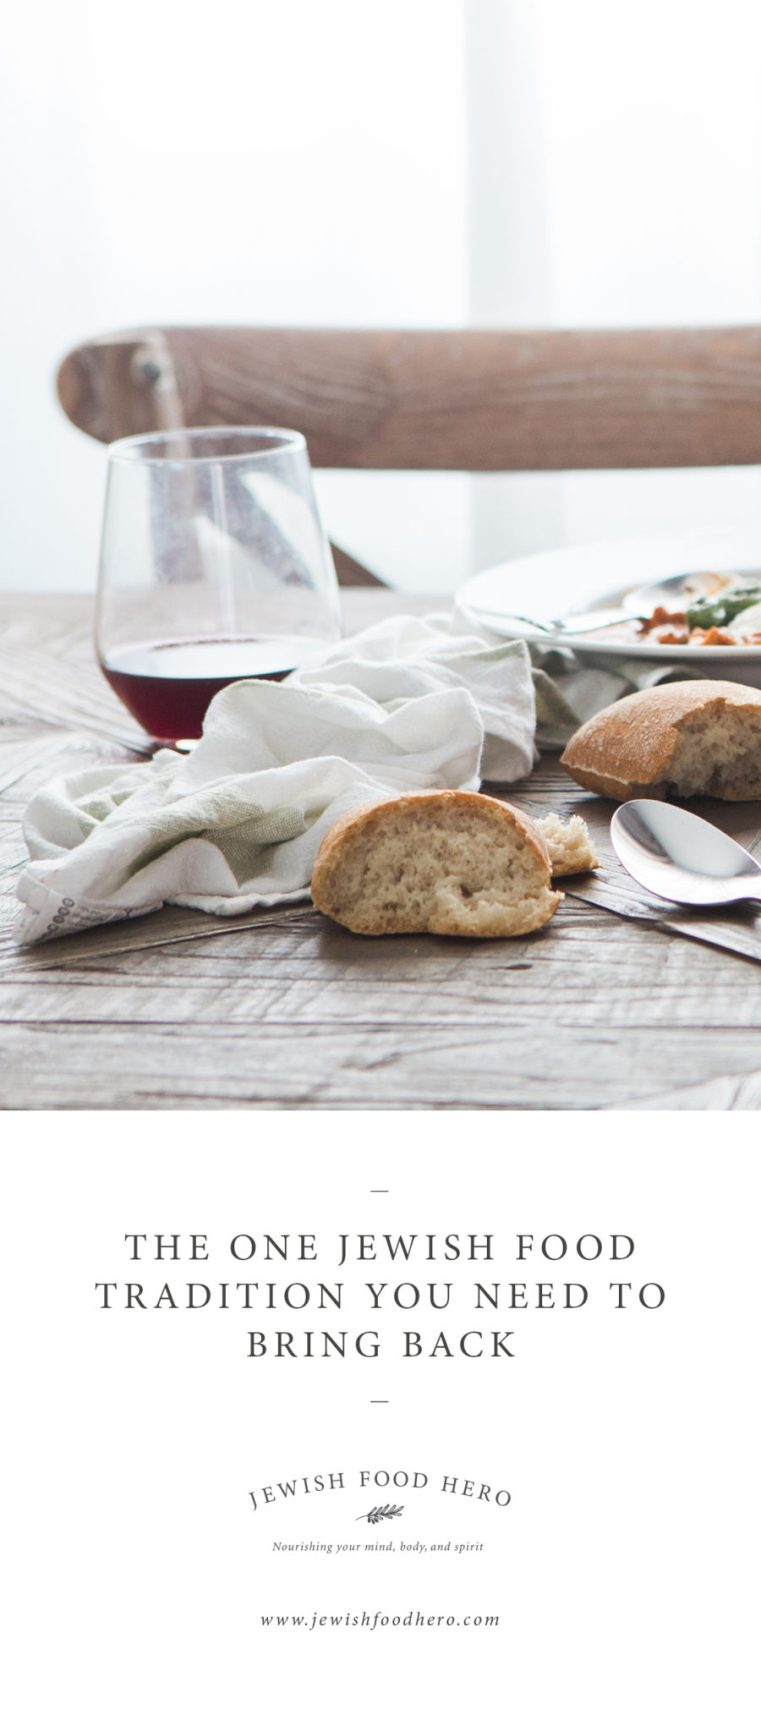 Food traditions, Jewish food traditions, Jewish traditions